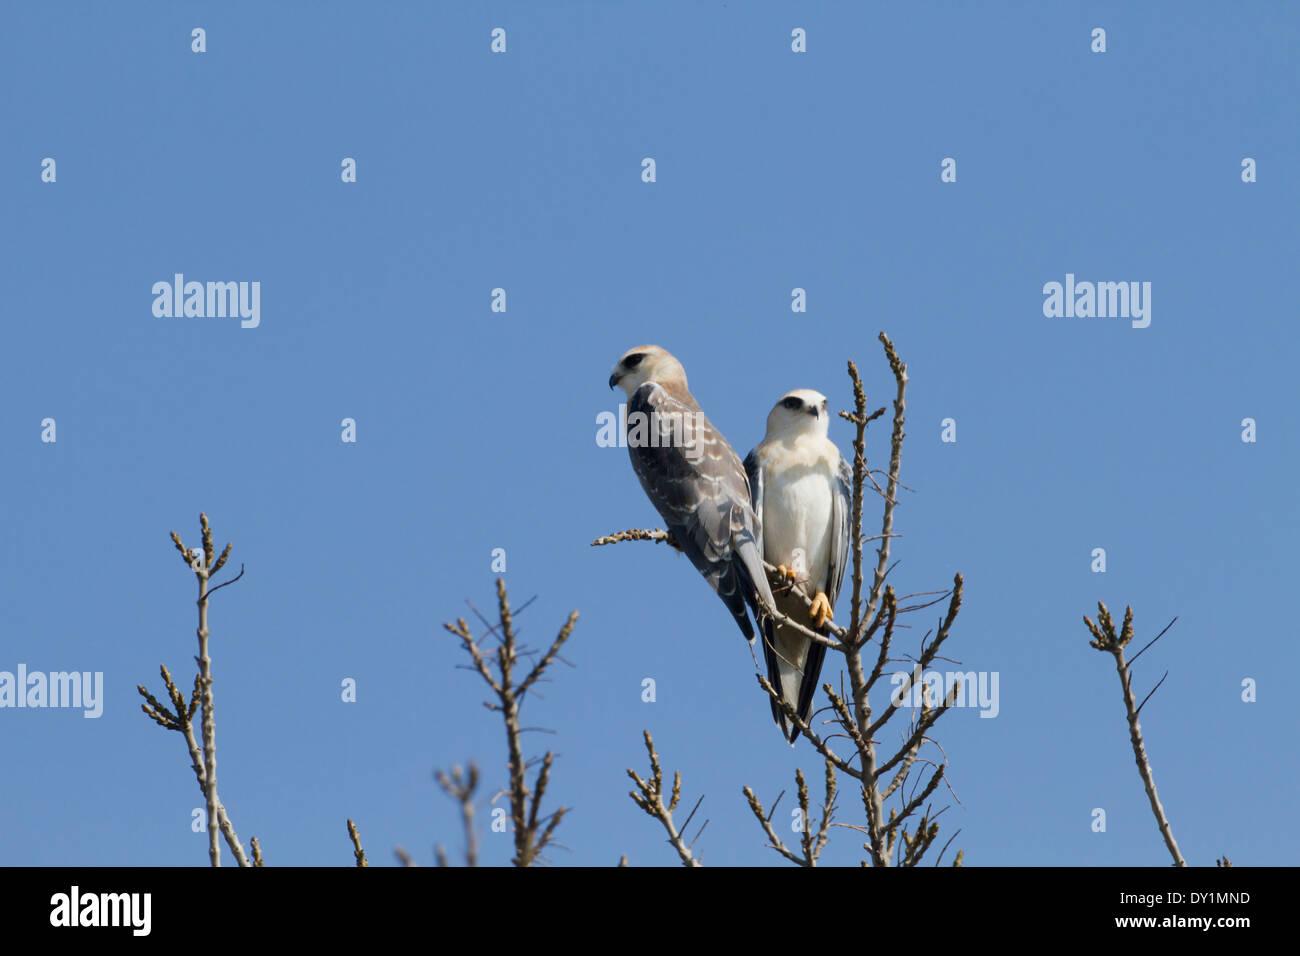 Gleitaar (Elanus Caeruleus) 2 auf Baumkronen, Hulla-Tal, Israel Stockbild